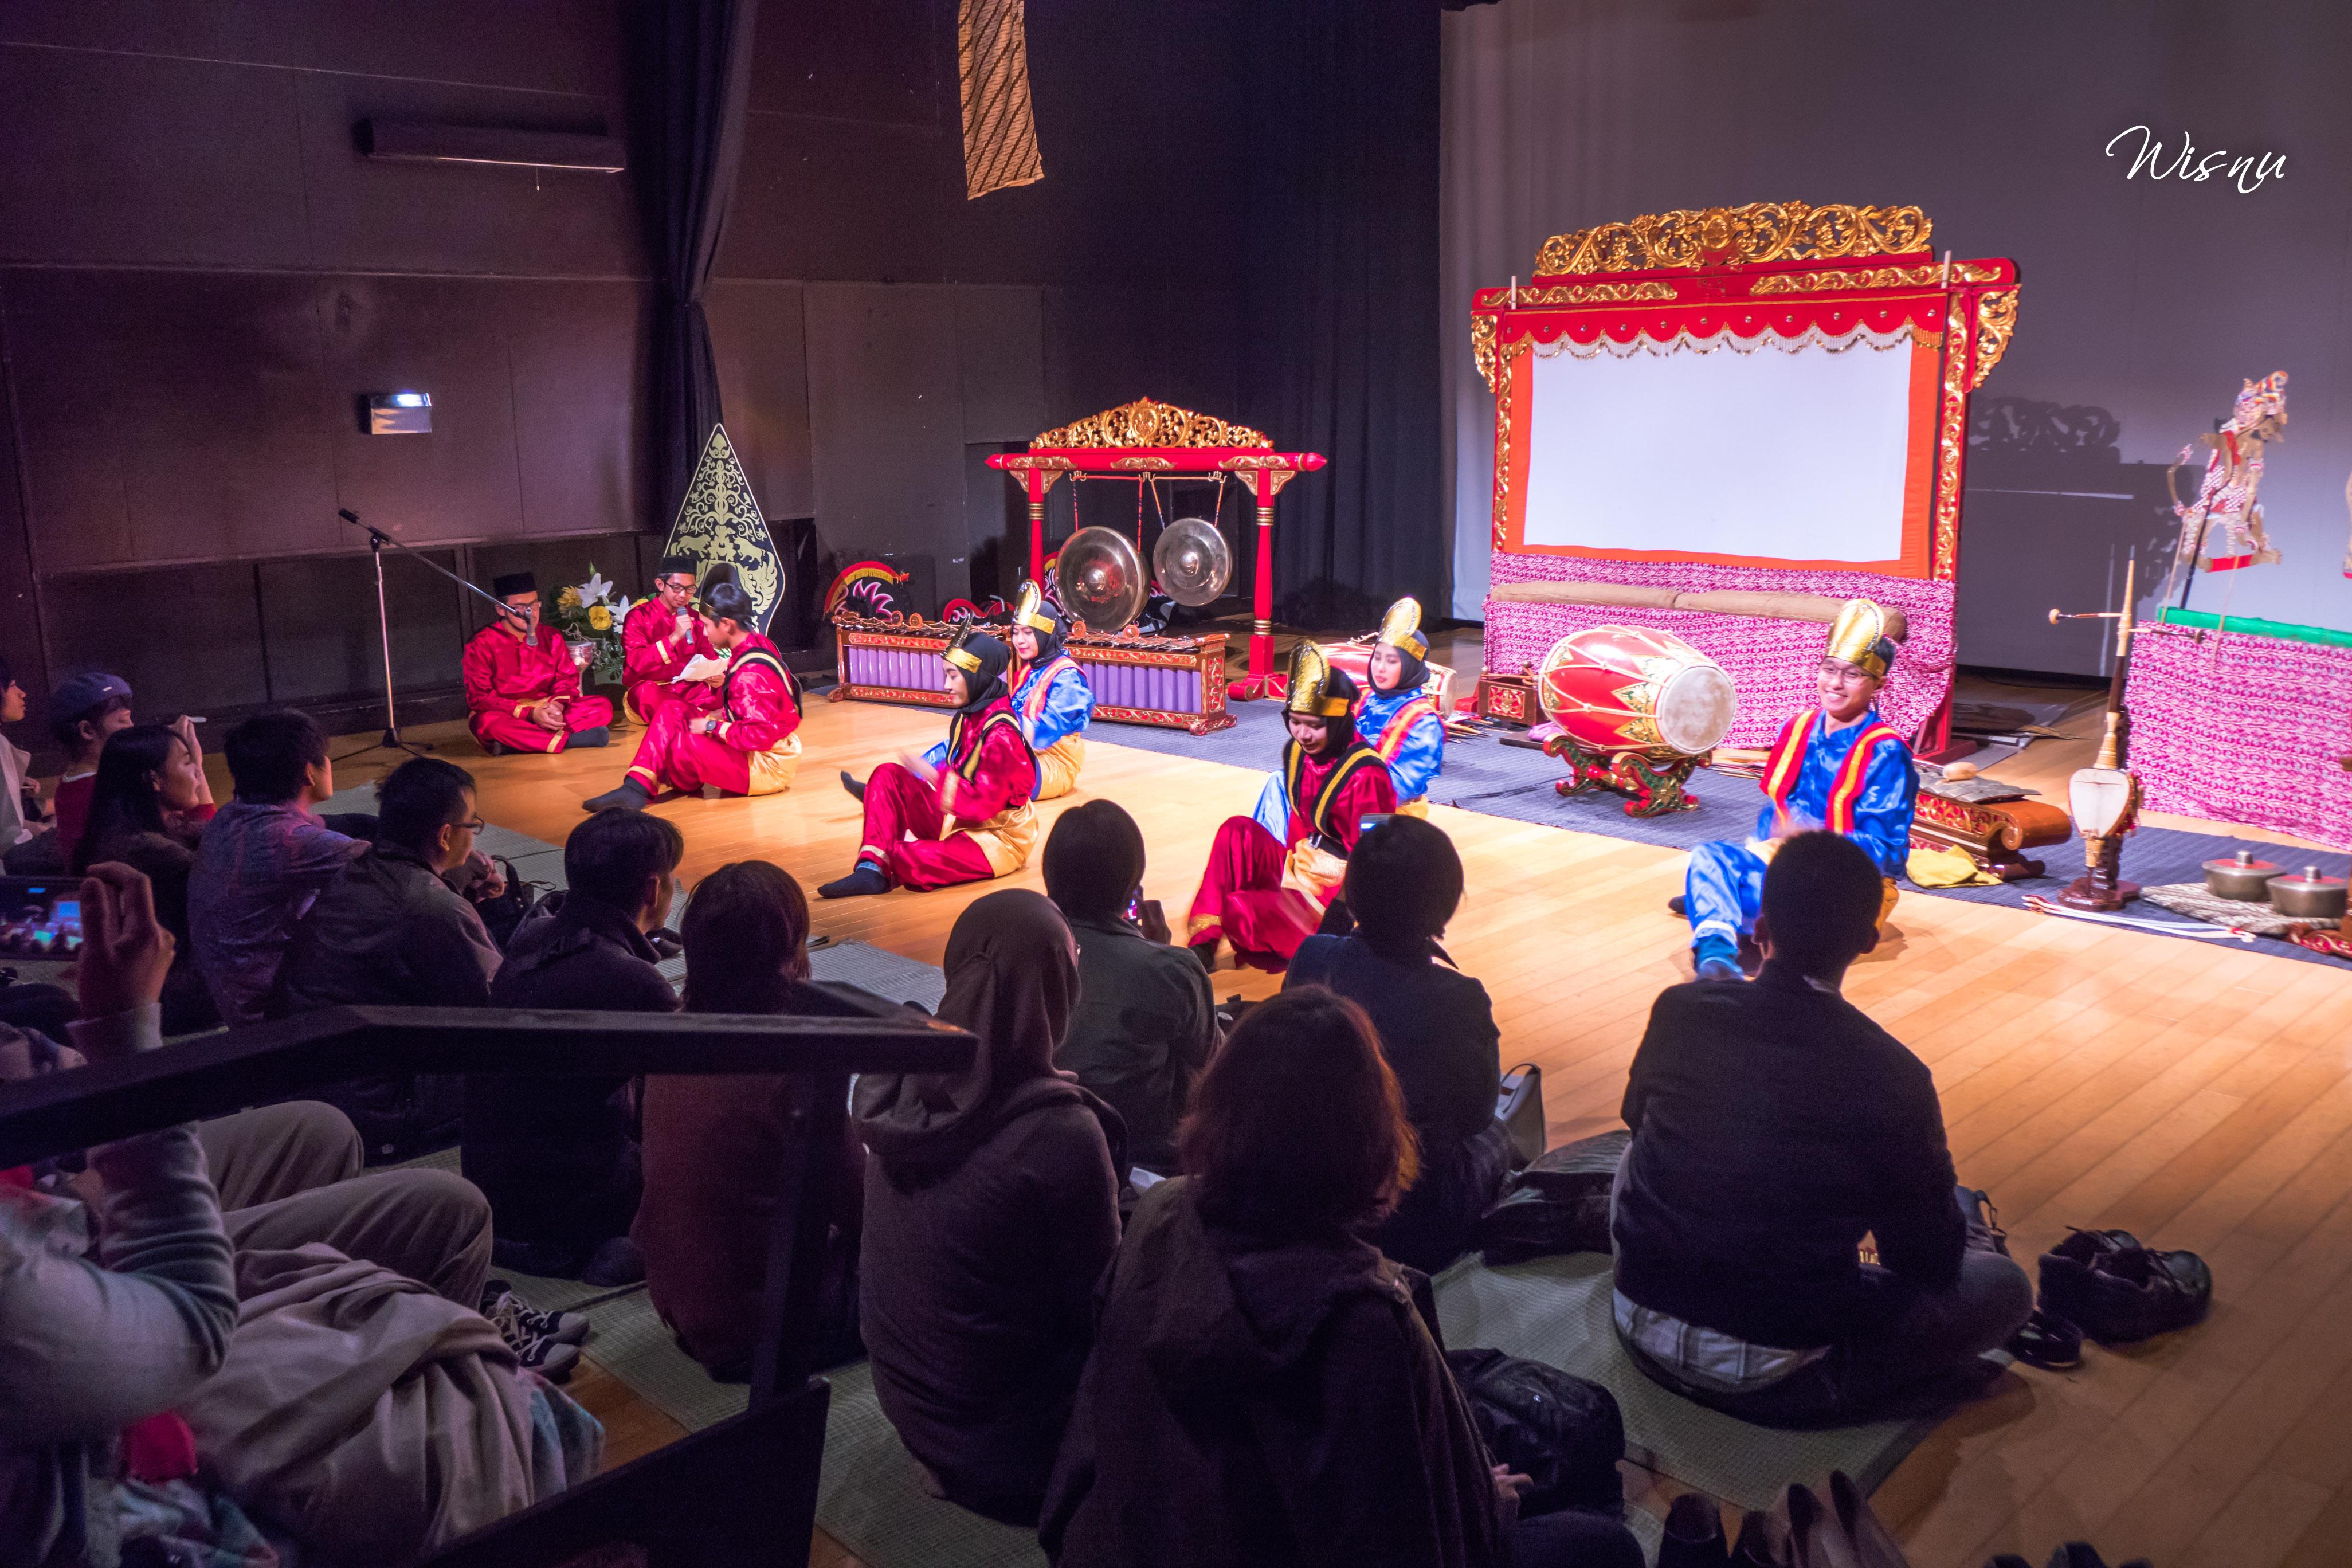 Indonesia Culture Day 2017, Mengenalkan Budaya Indonesia di Negeri Sakura  Good News from Indonesia